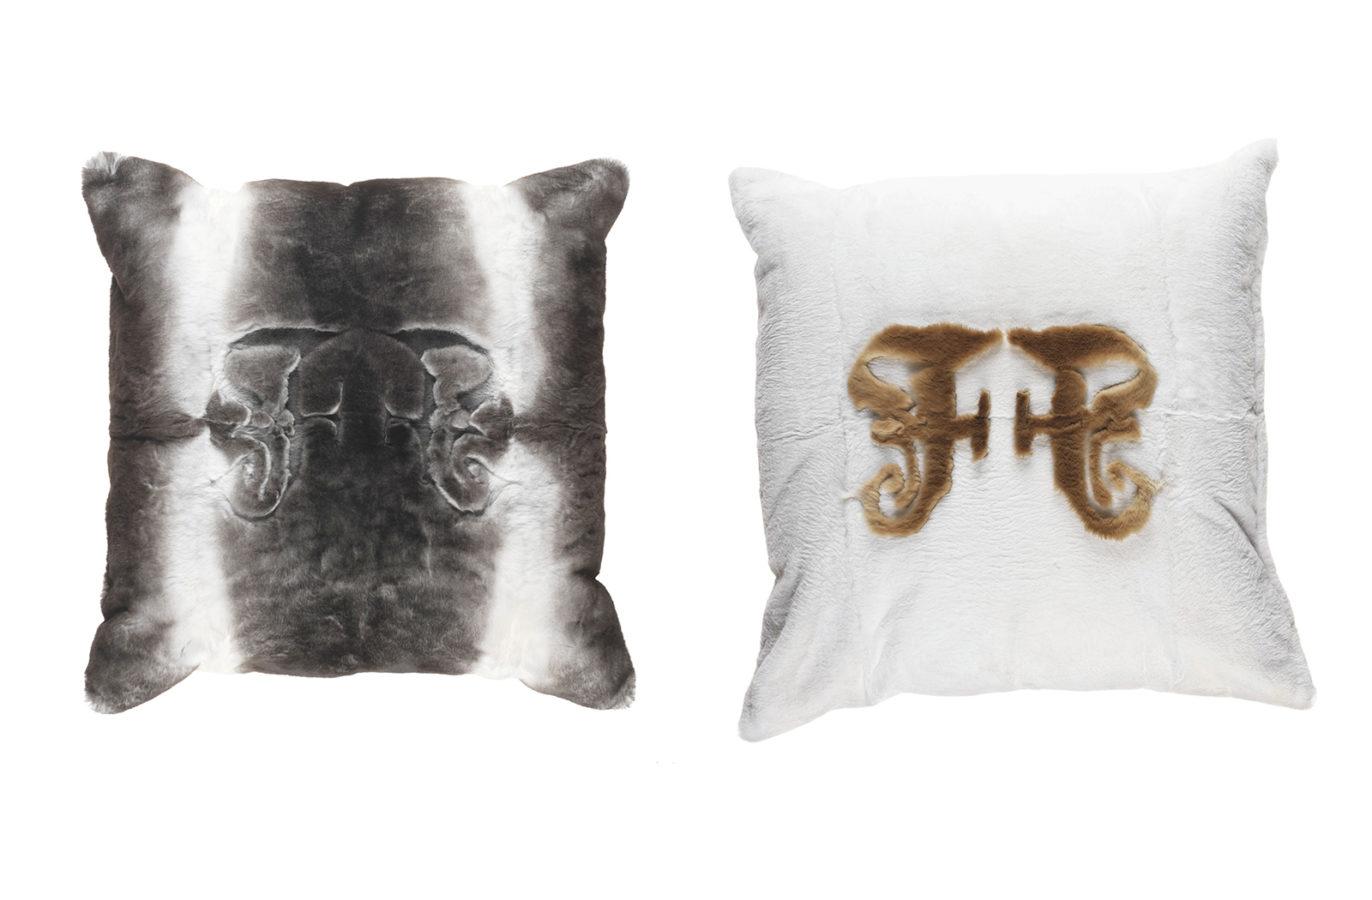 Gianfranco Ferre Homekirah Gothic Cushion